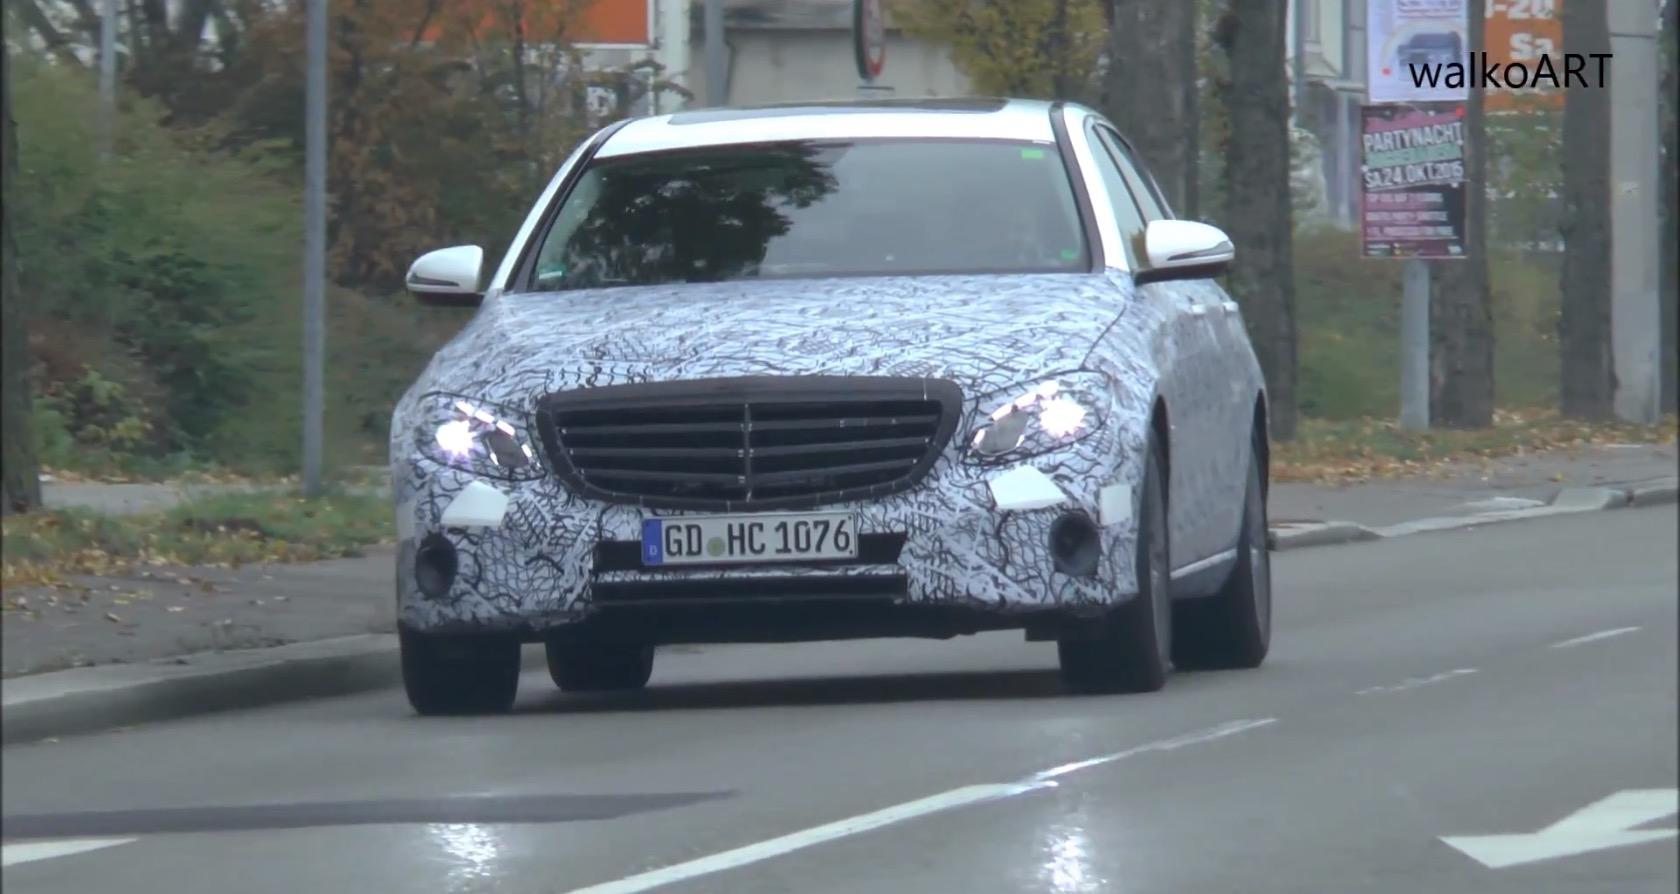 2017 Mercedes Benz E Class Long Wheelbase Is The Mini Maybach In